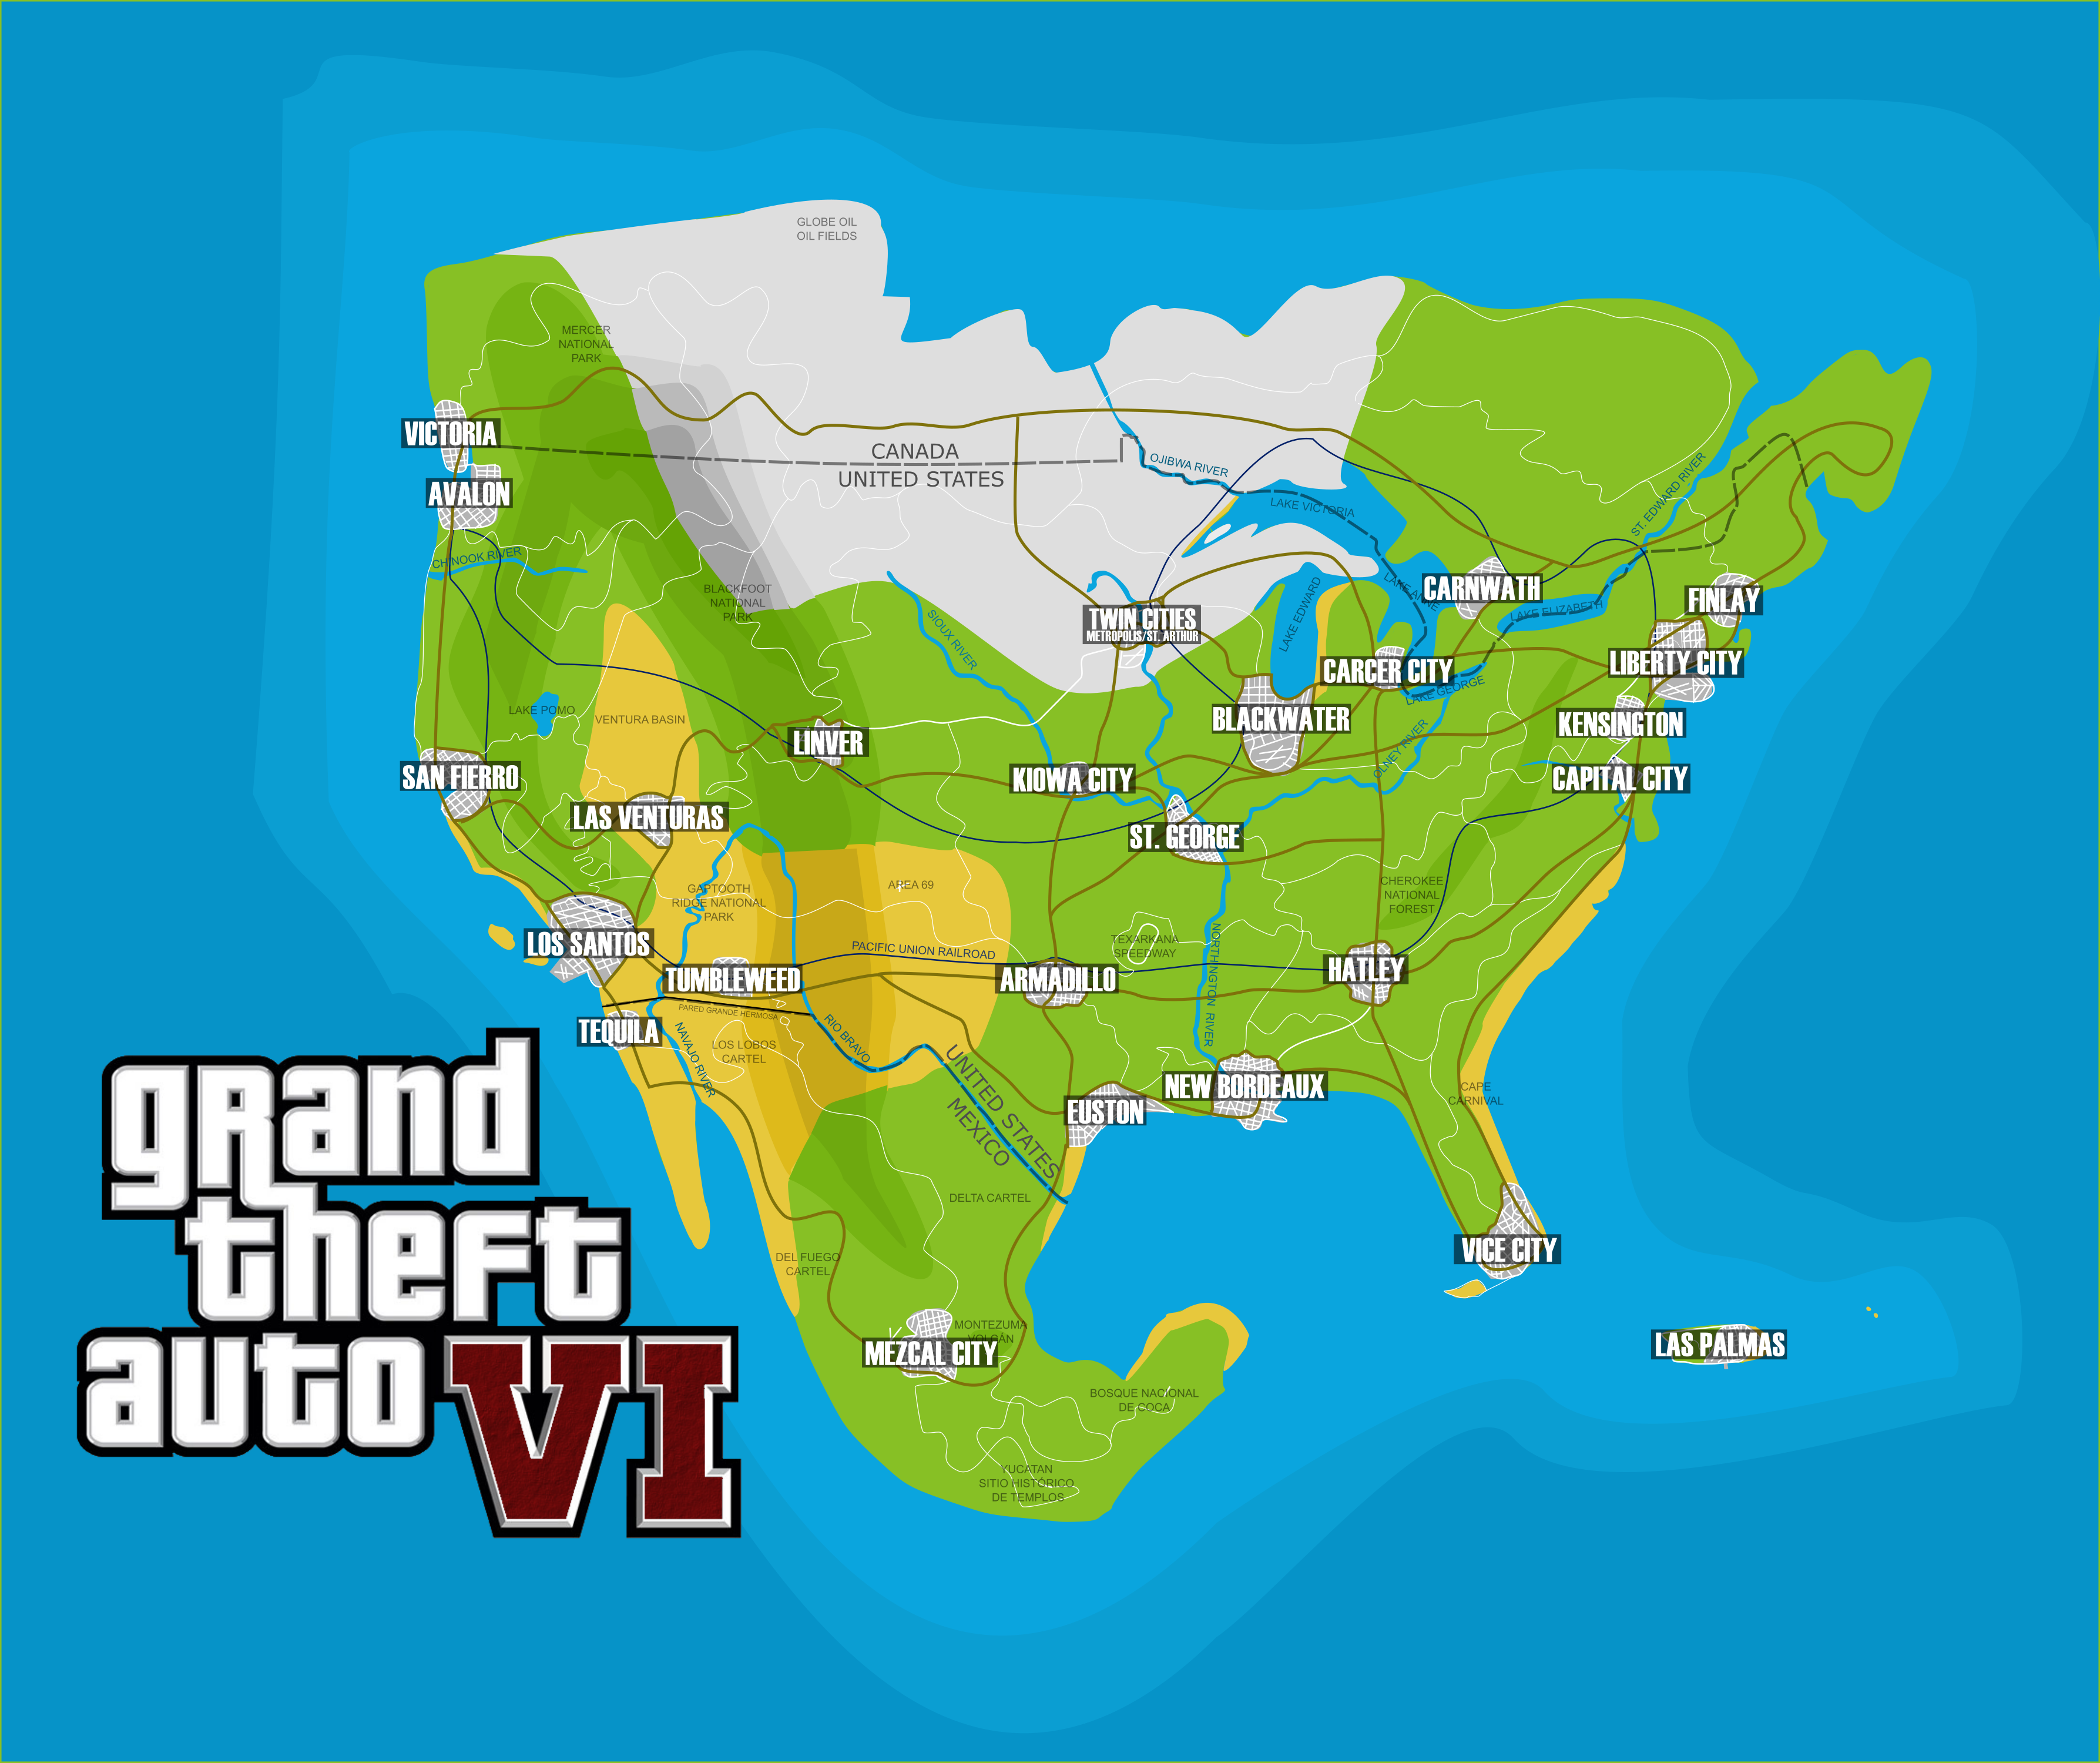 GTA VI Concept Map [OC] | gaming | Pinterest | Gta vi, Gta and Grand ...